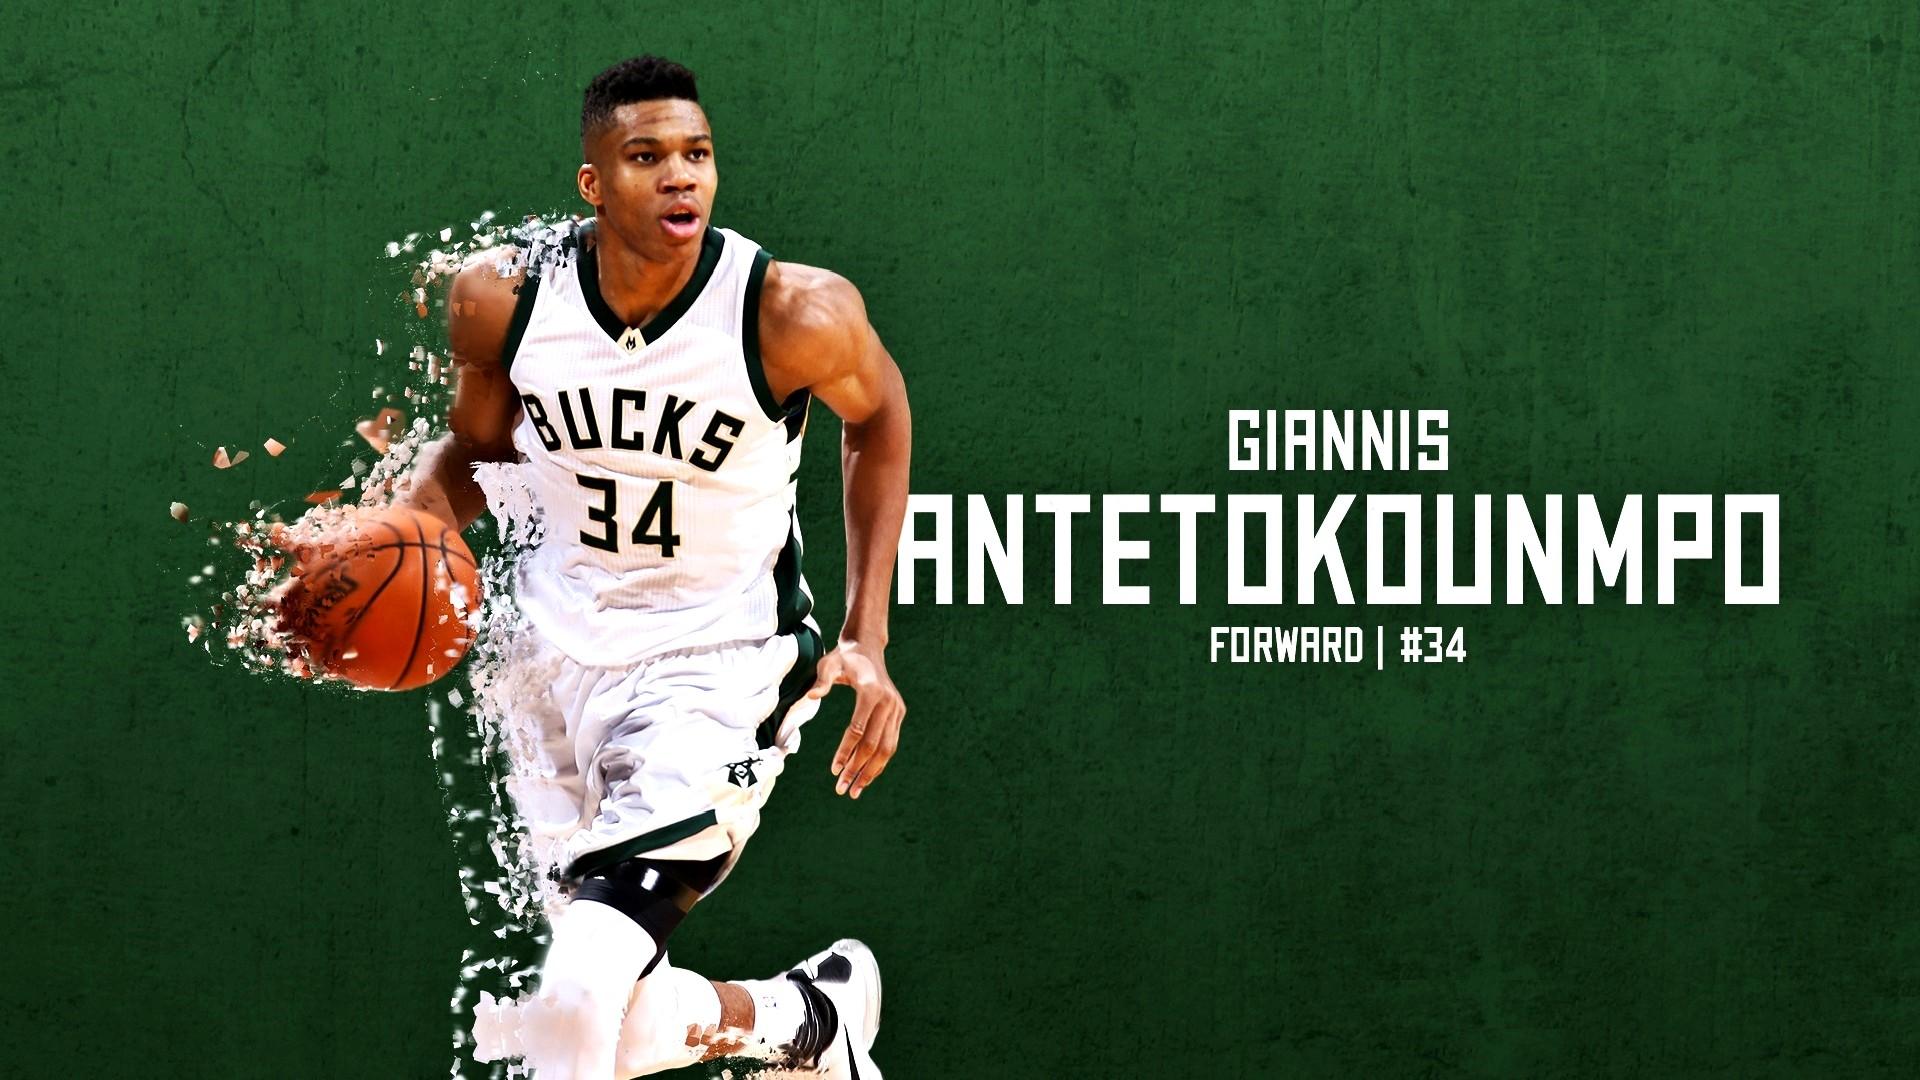 Giannis Antetokounmpo Desktop Wallpaper